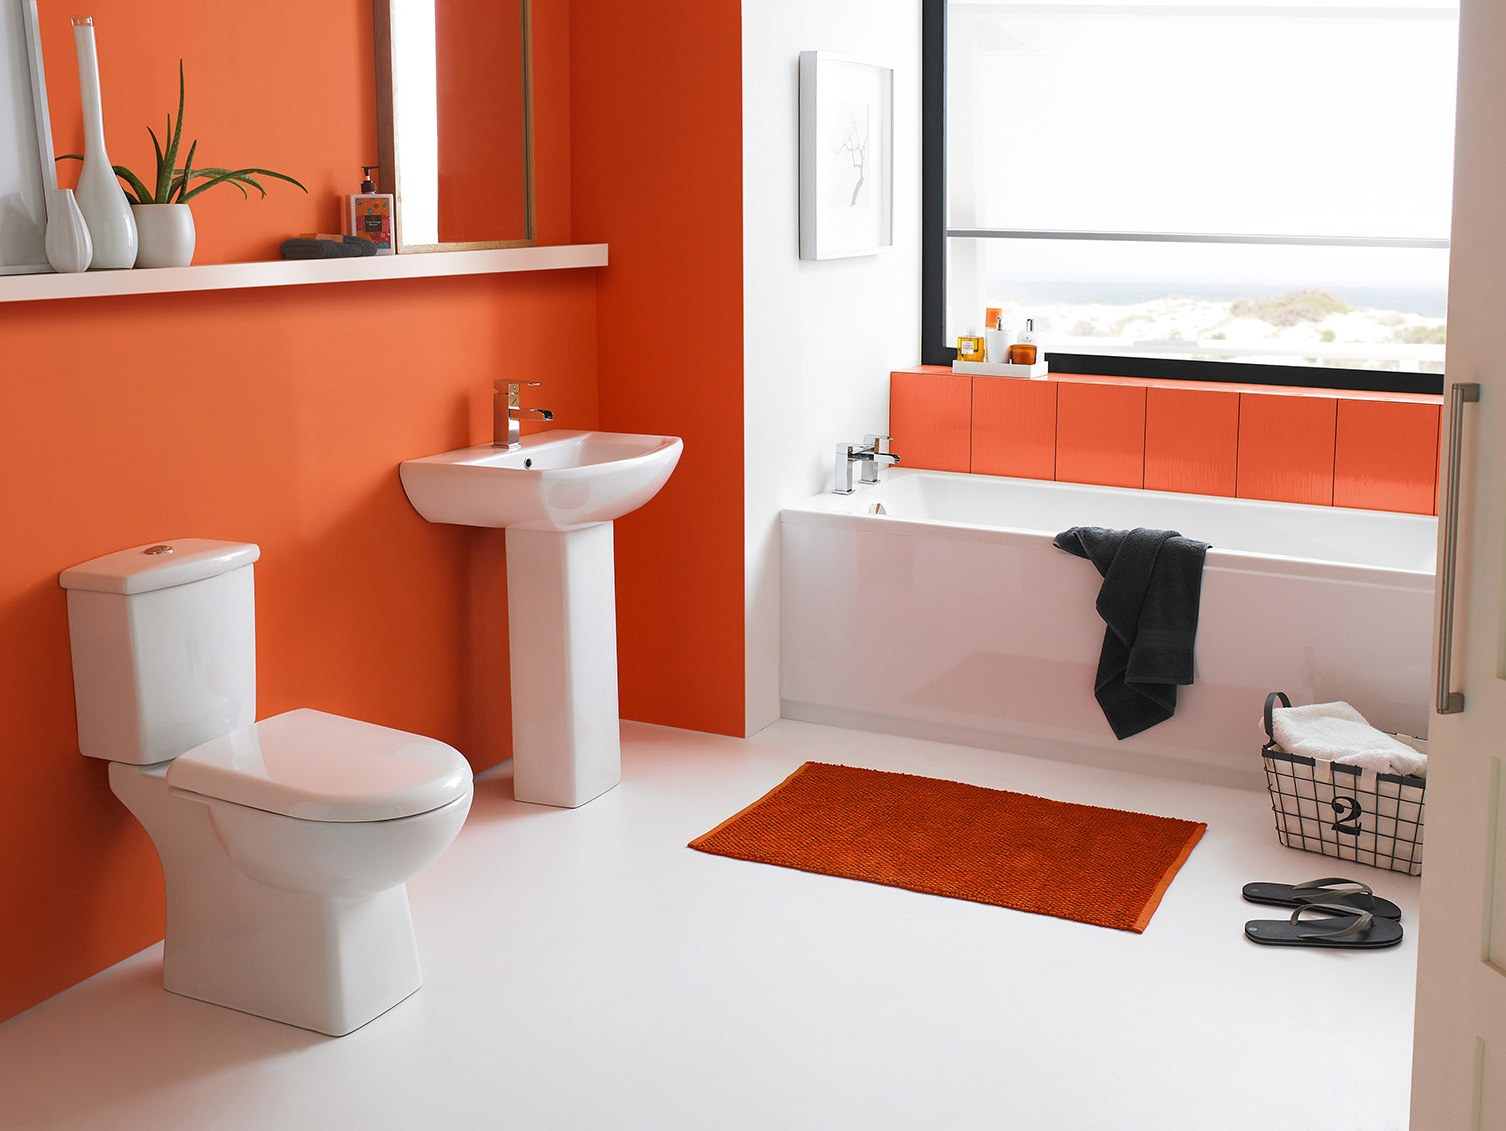 Покраска ванной комнаты своими руками фото 465